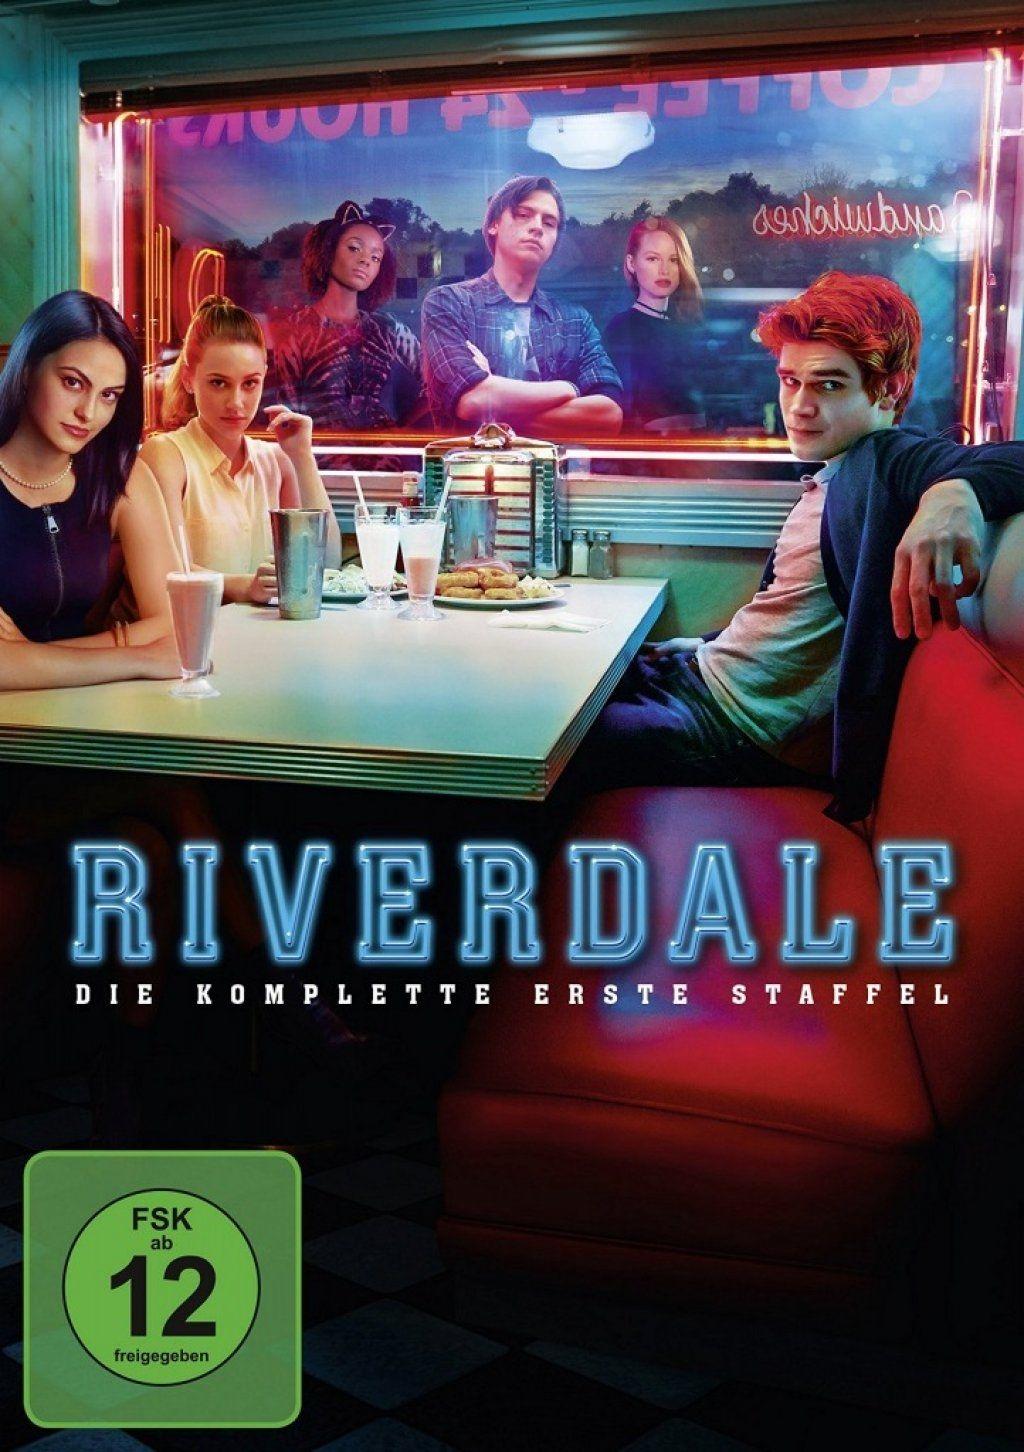 Riverdale - Staffel 1 (3 Discs)